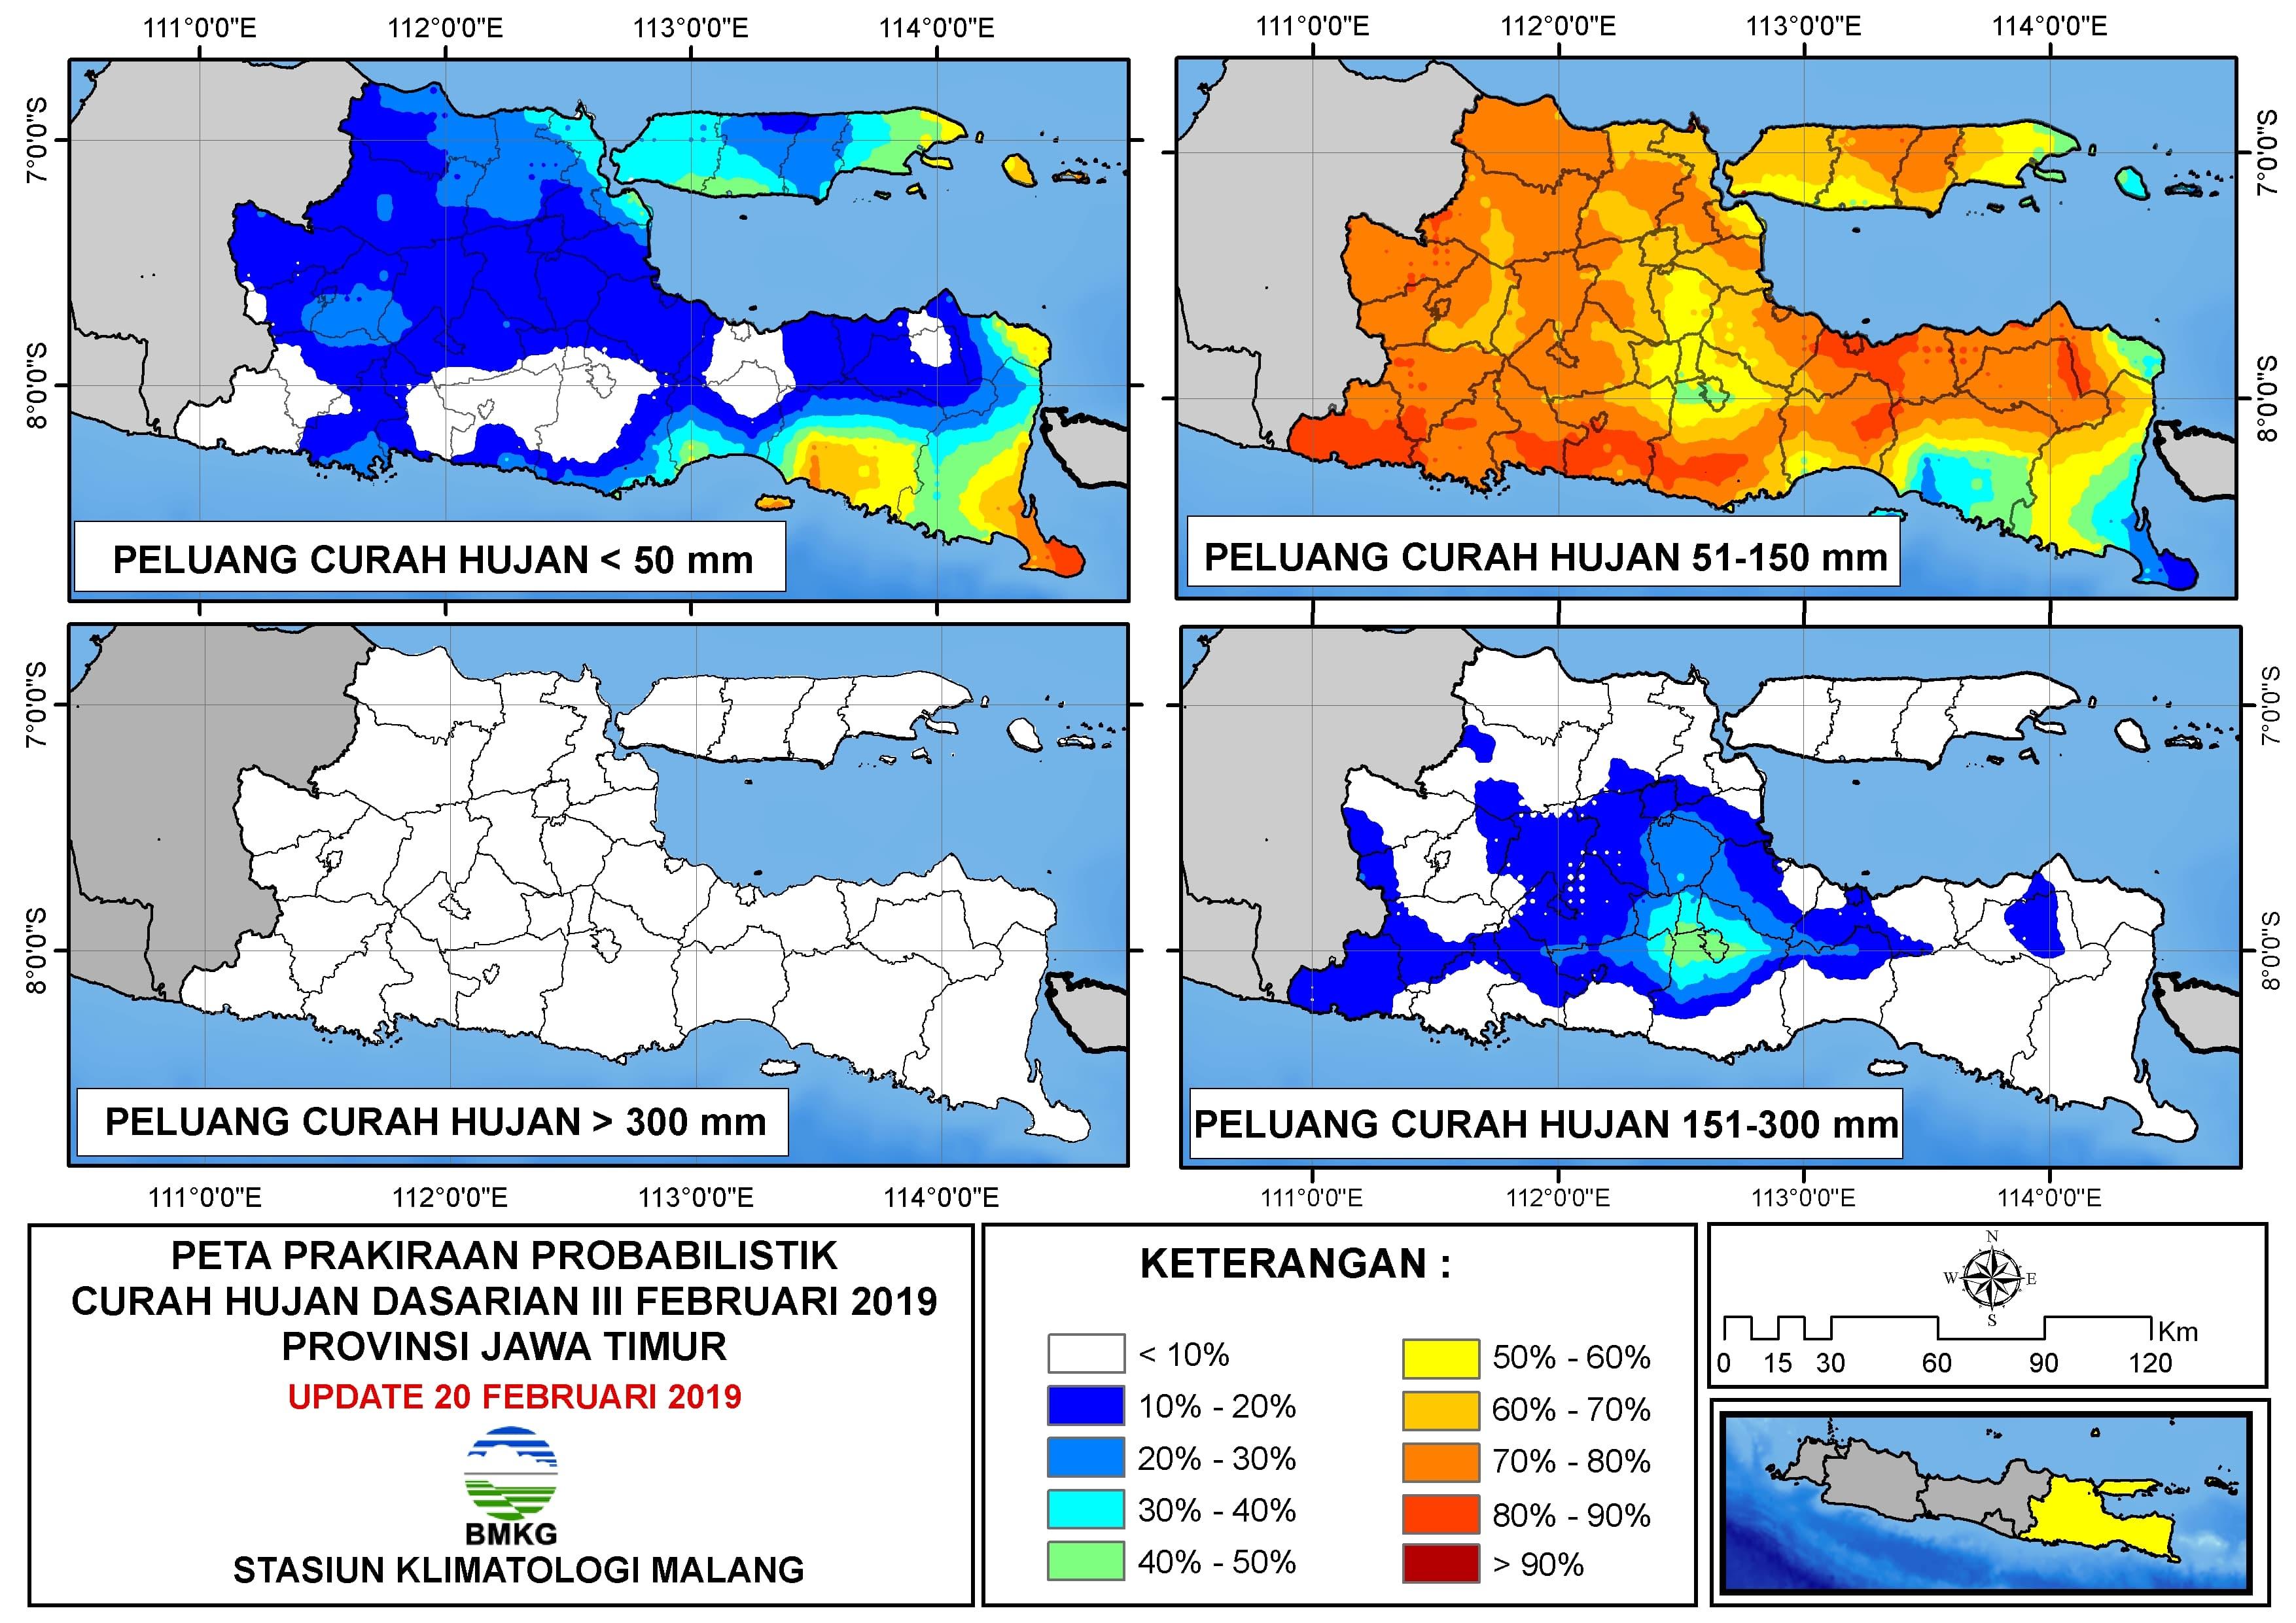 Peta Prakiraan Probabilistik Curah Hujan Dasarian Provinsi Jawa Timur Update 20 Februari 2019